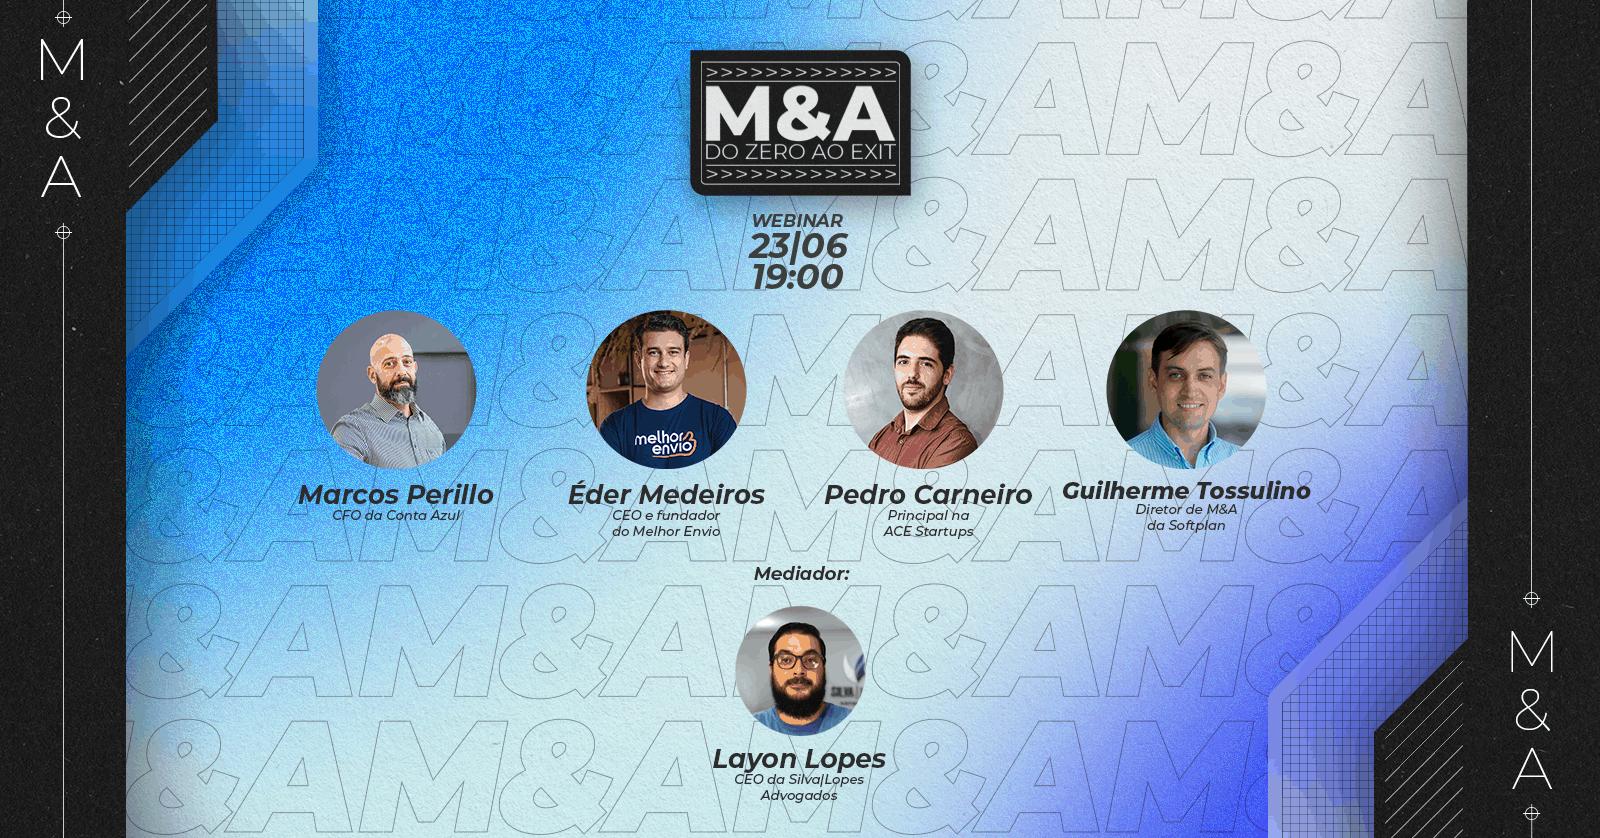 Silva Lopes Advogados realiza webinar gratuito sobre M&A